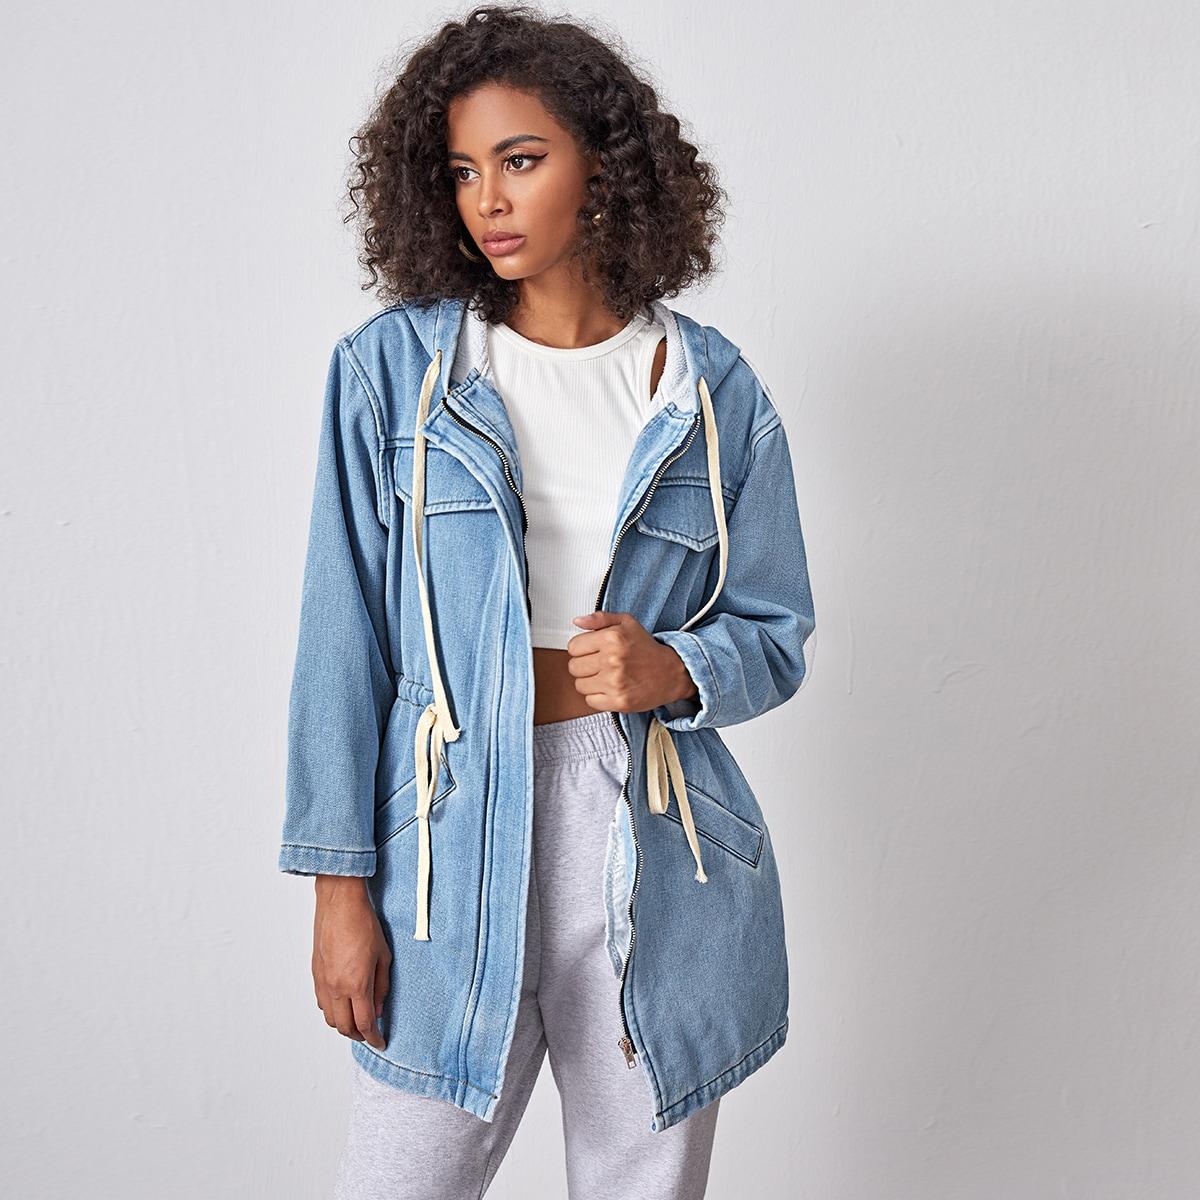 Джинсовая куртка с капюшоном на кулиске